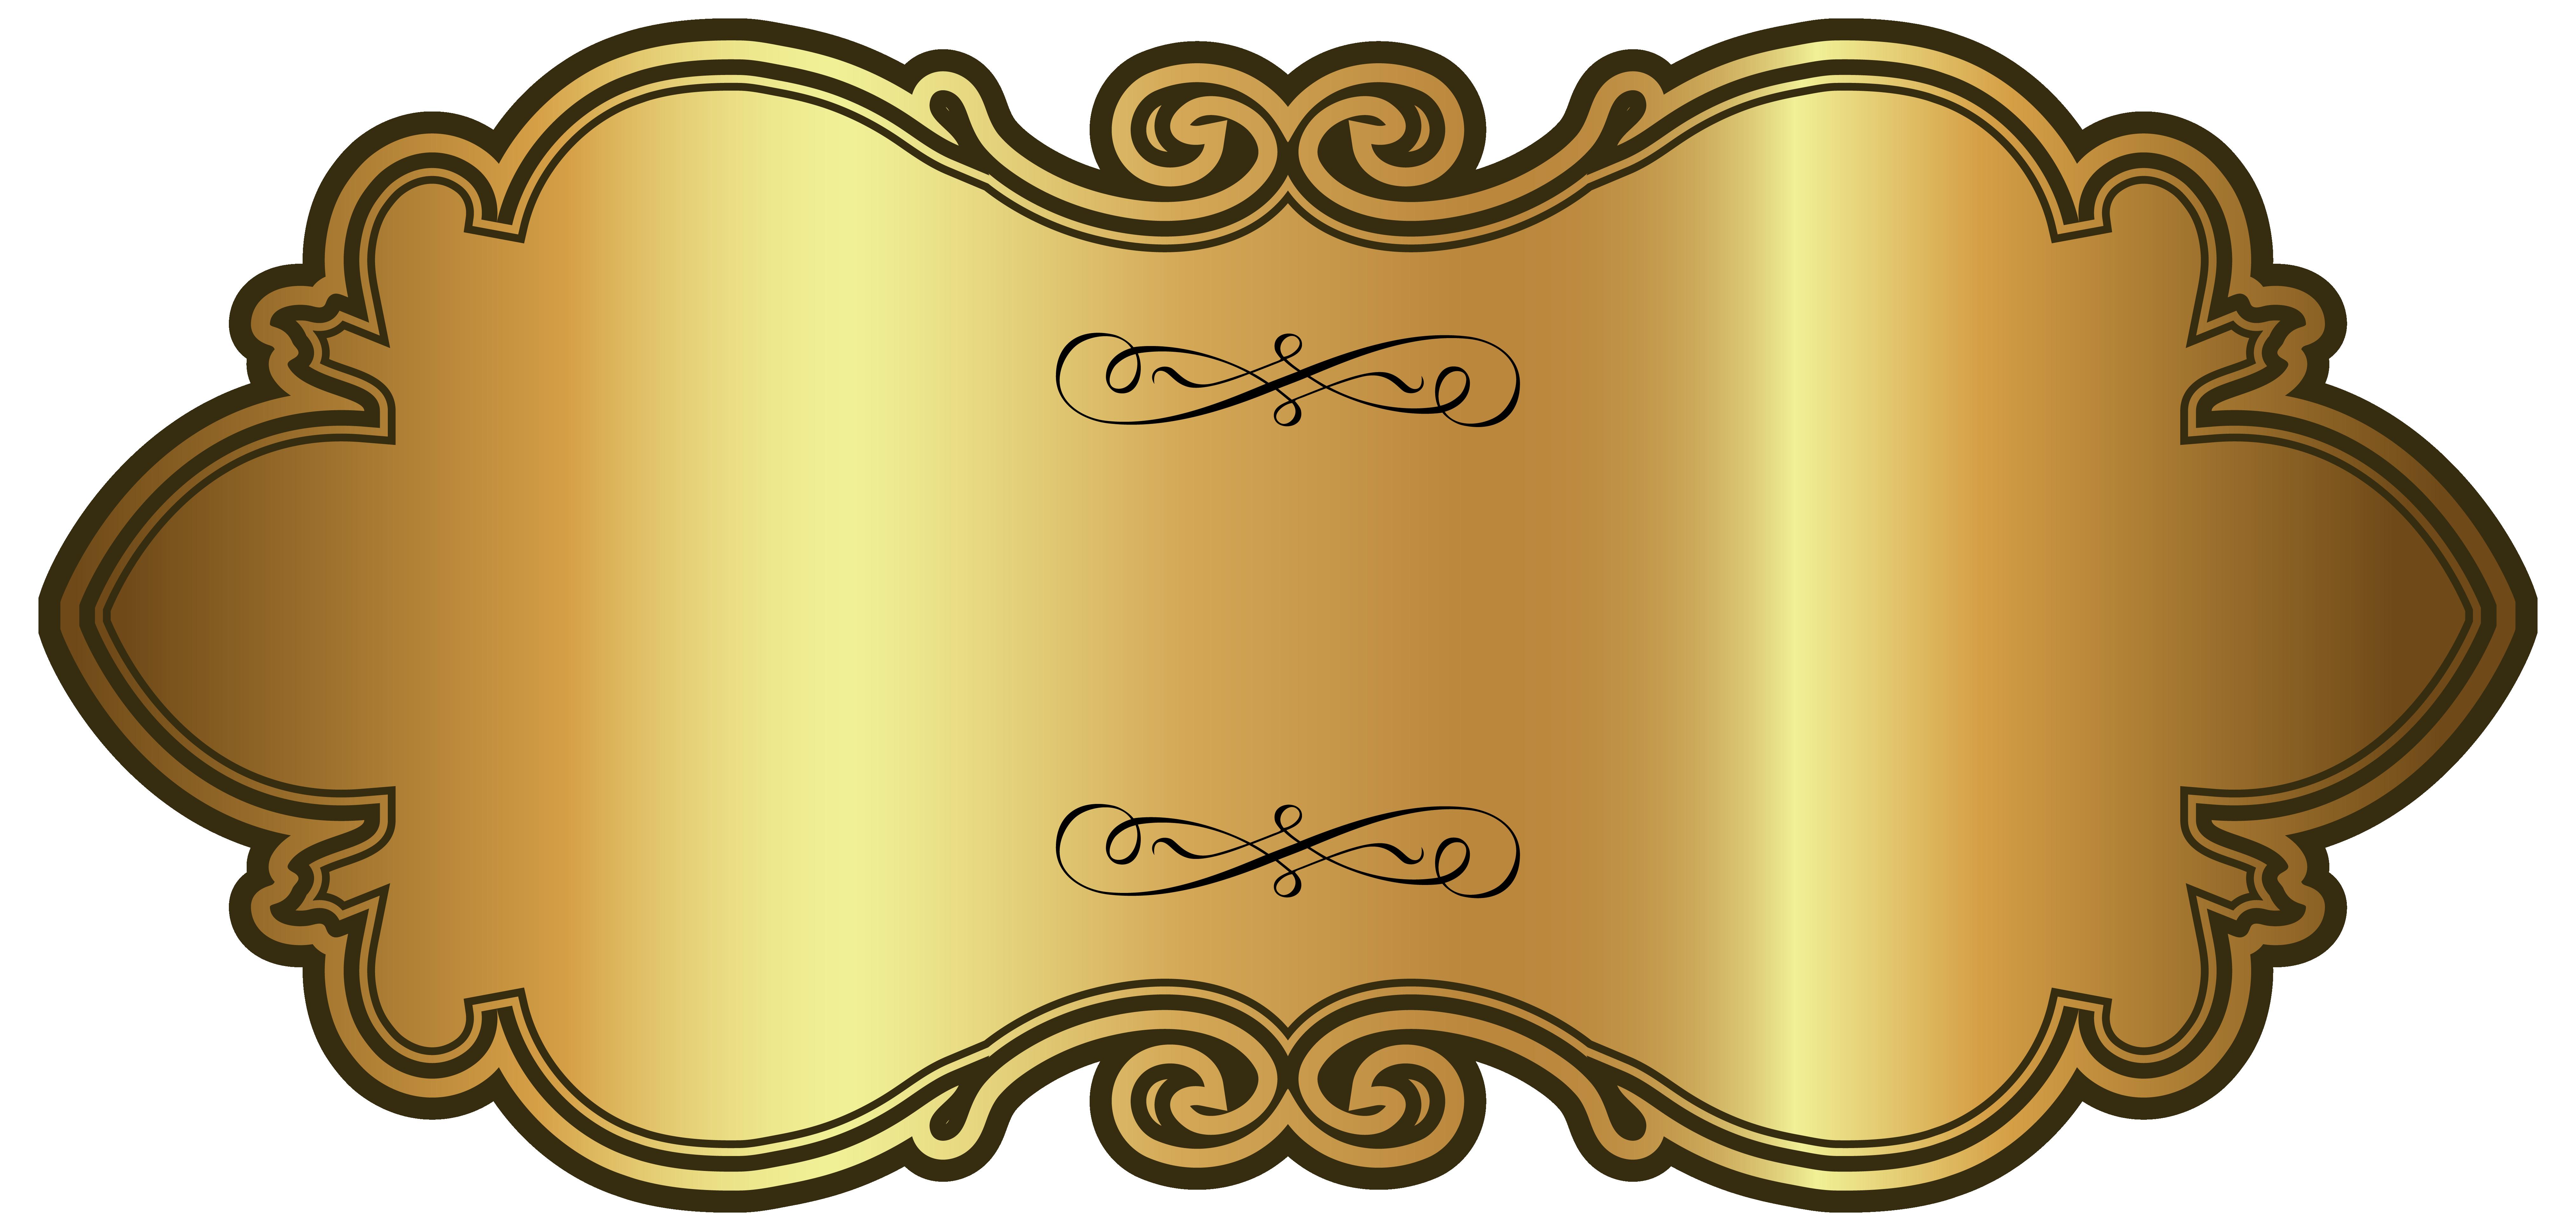 Golden luxury label template. Marriage clipart drum